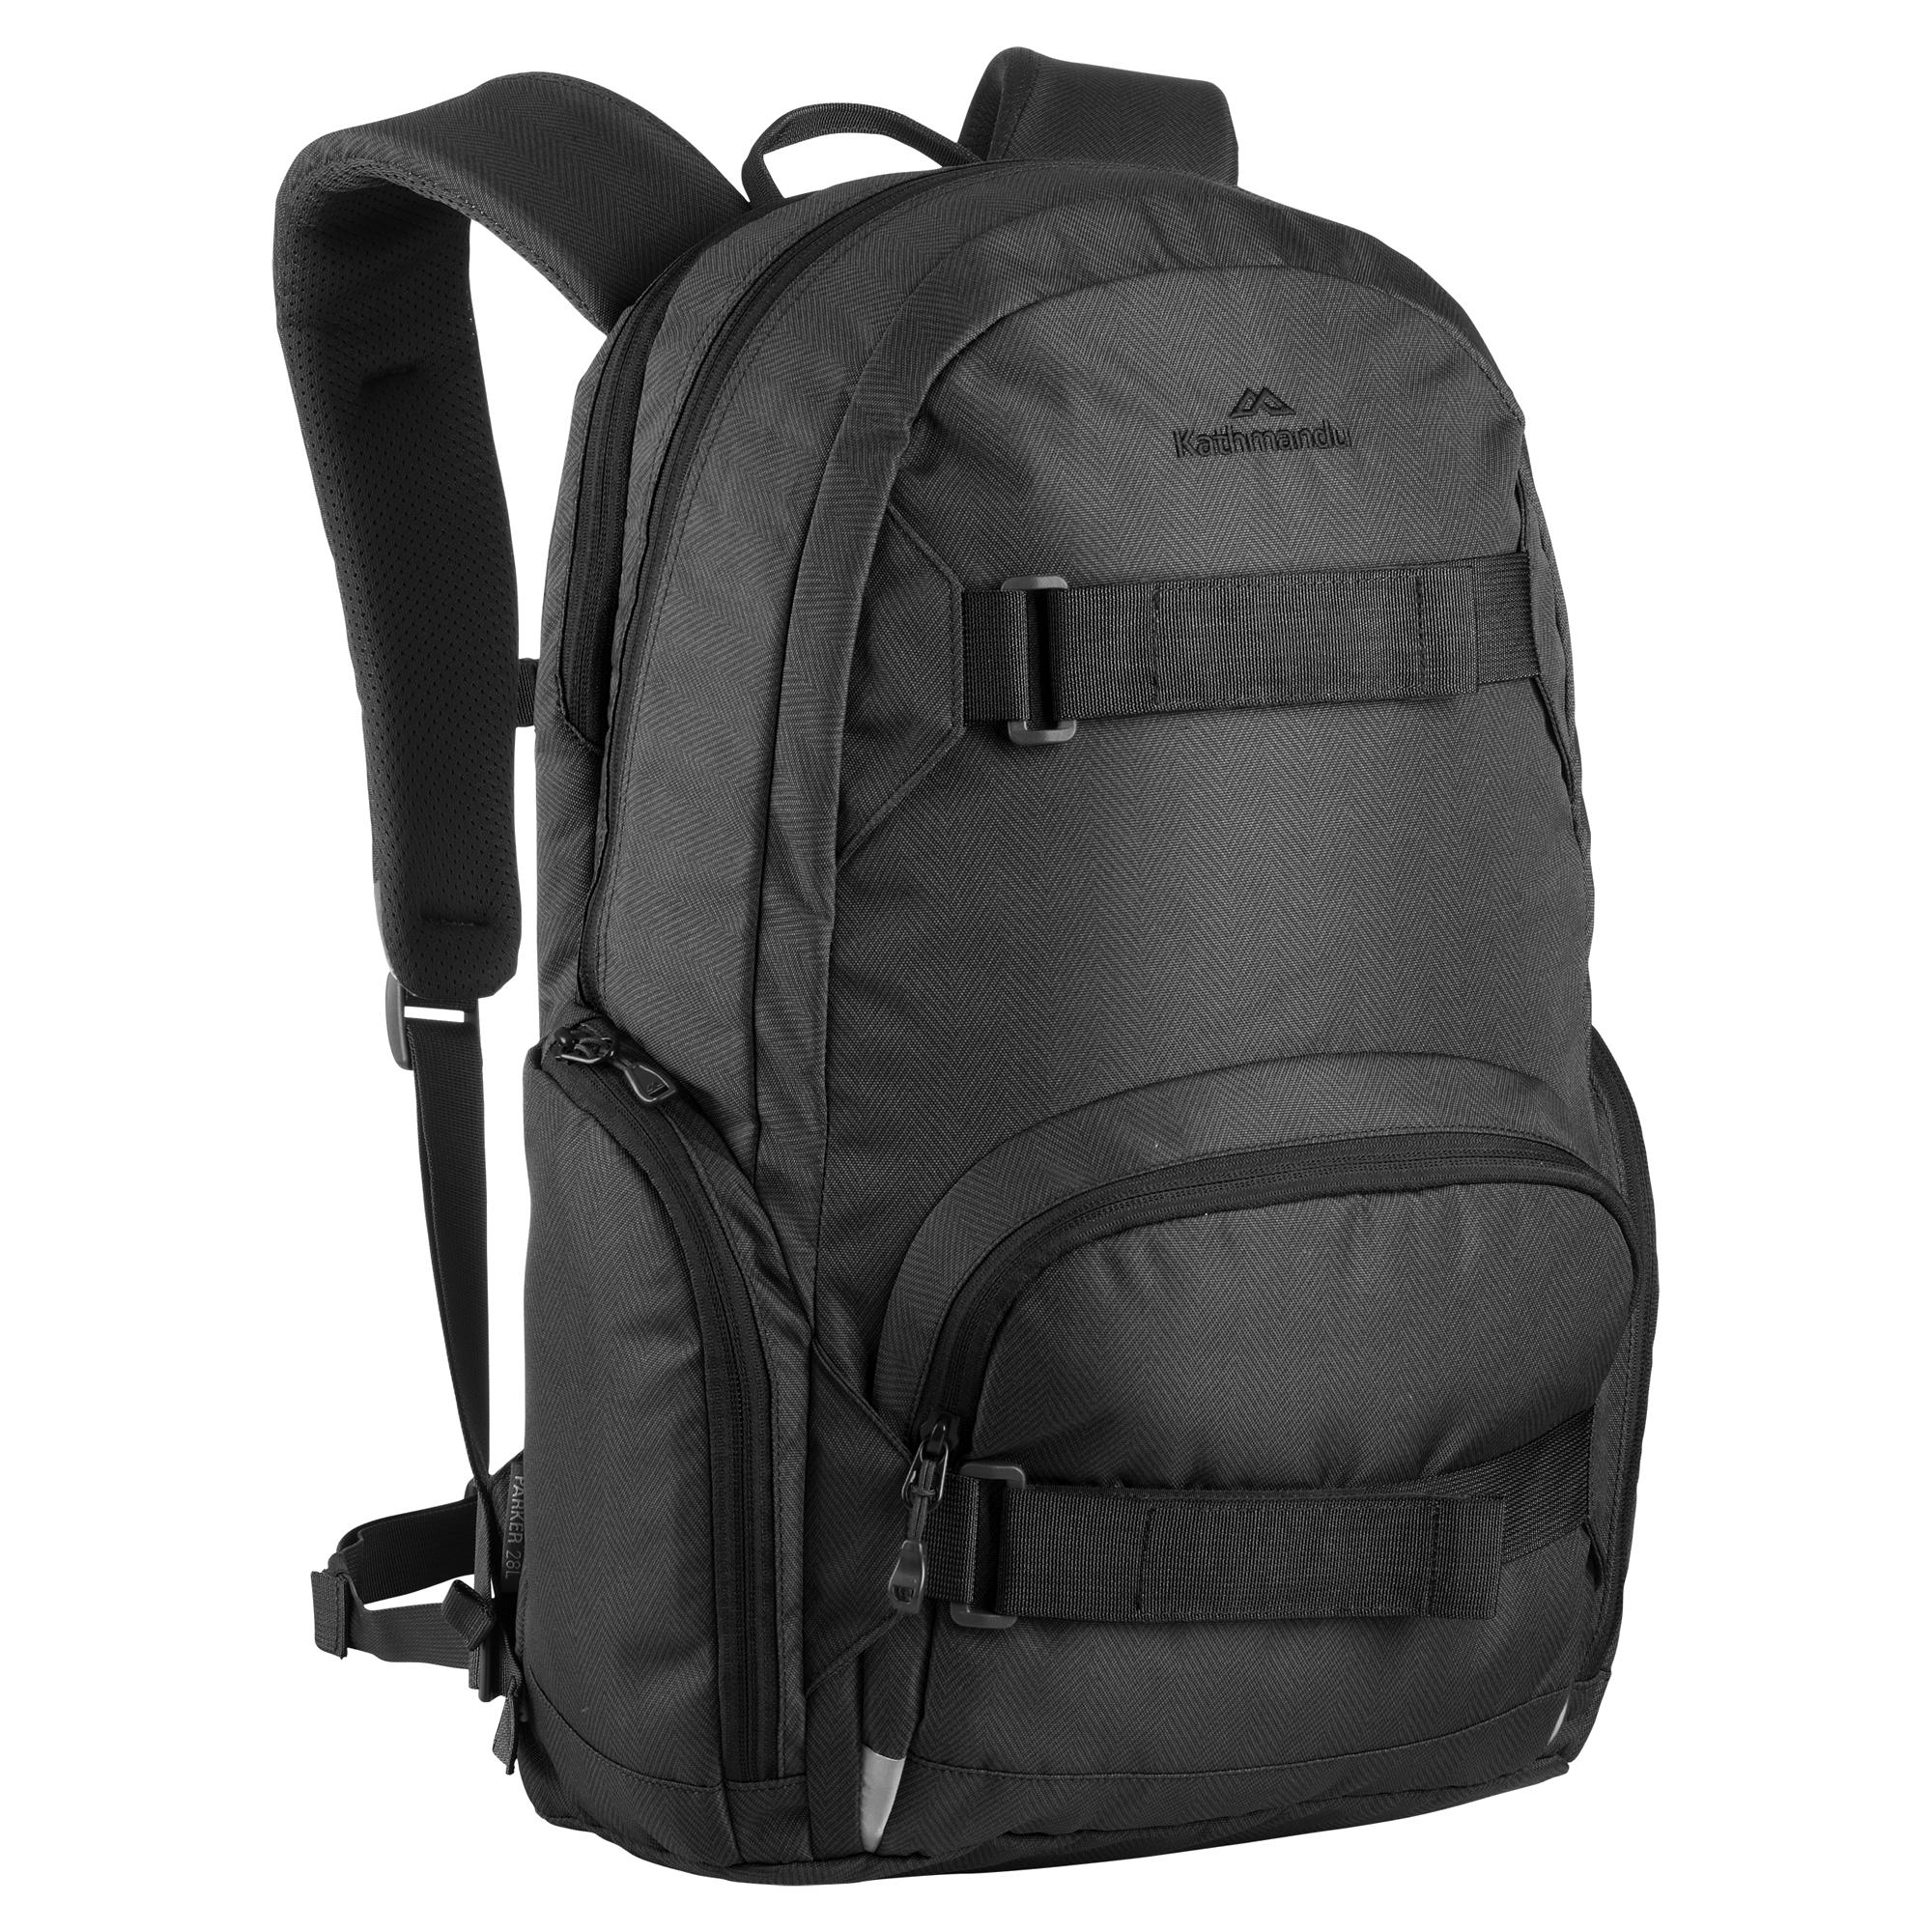 Kathmandu Black Backpack PNG Image Black backpack